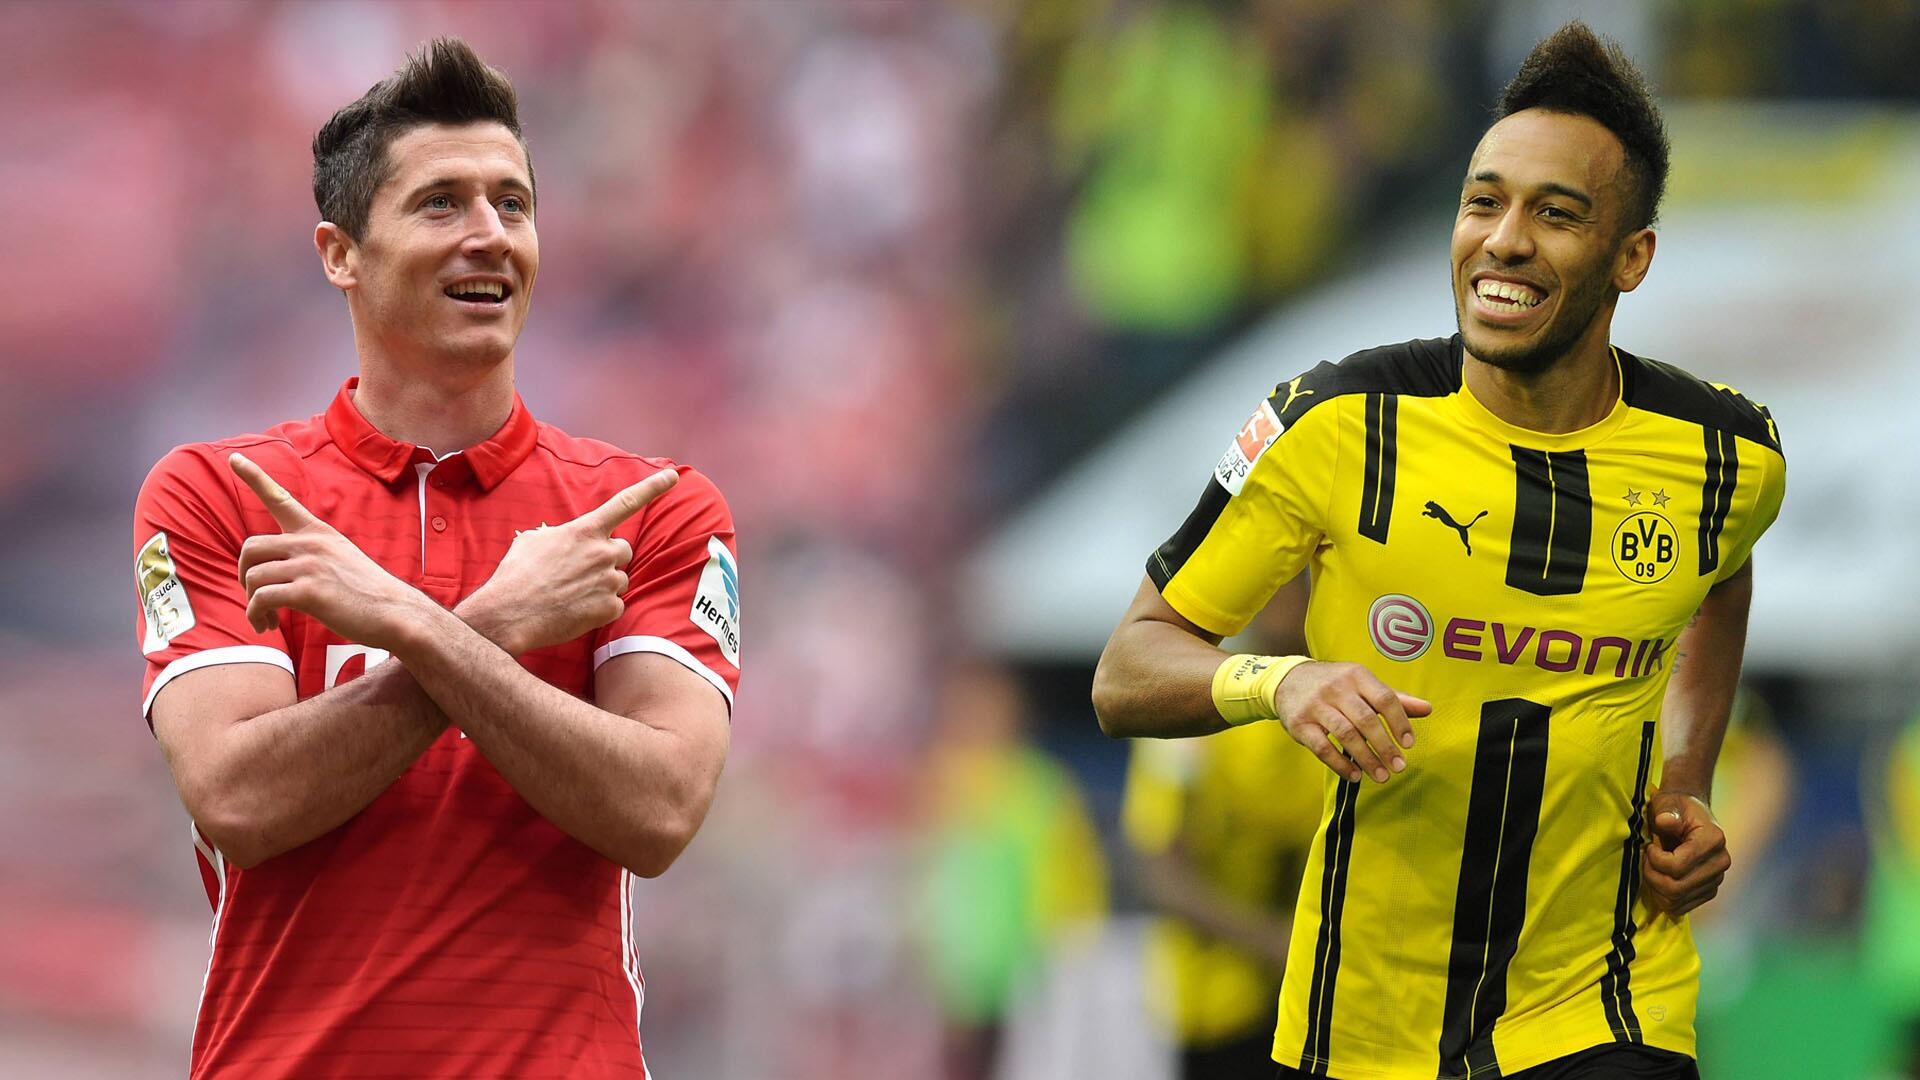 Bild zu FC Bayern München, Borussia Dortmund, Bundesliga, Lewandowski, Aubameyang